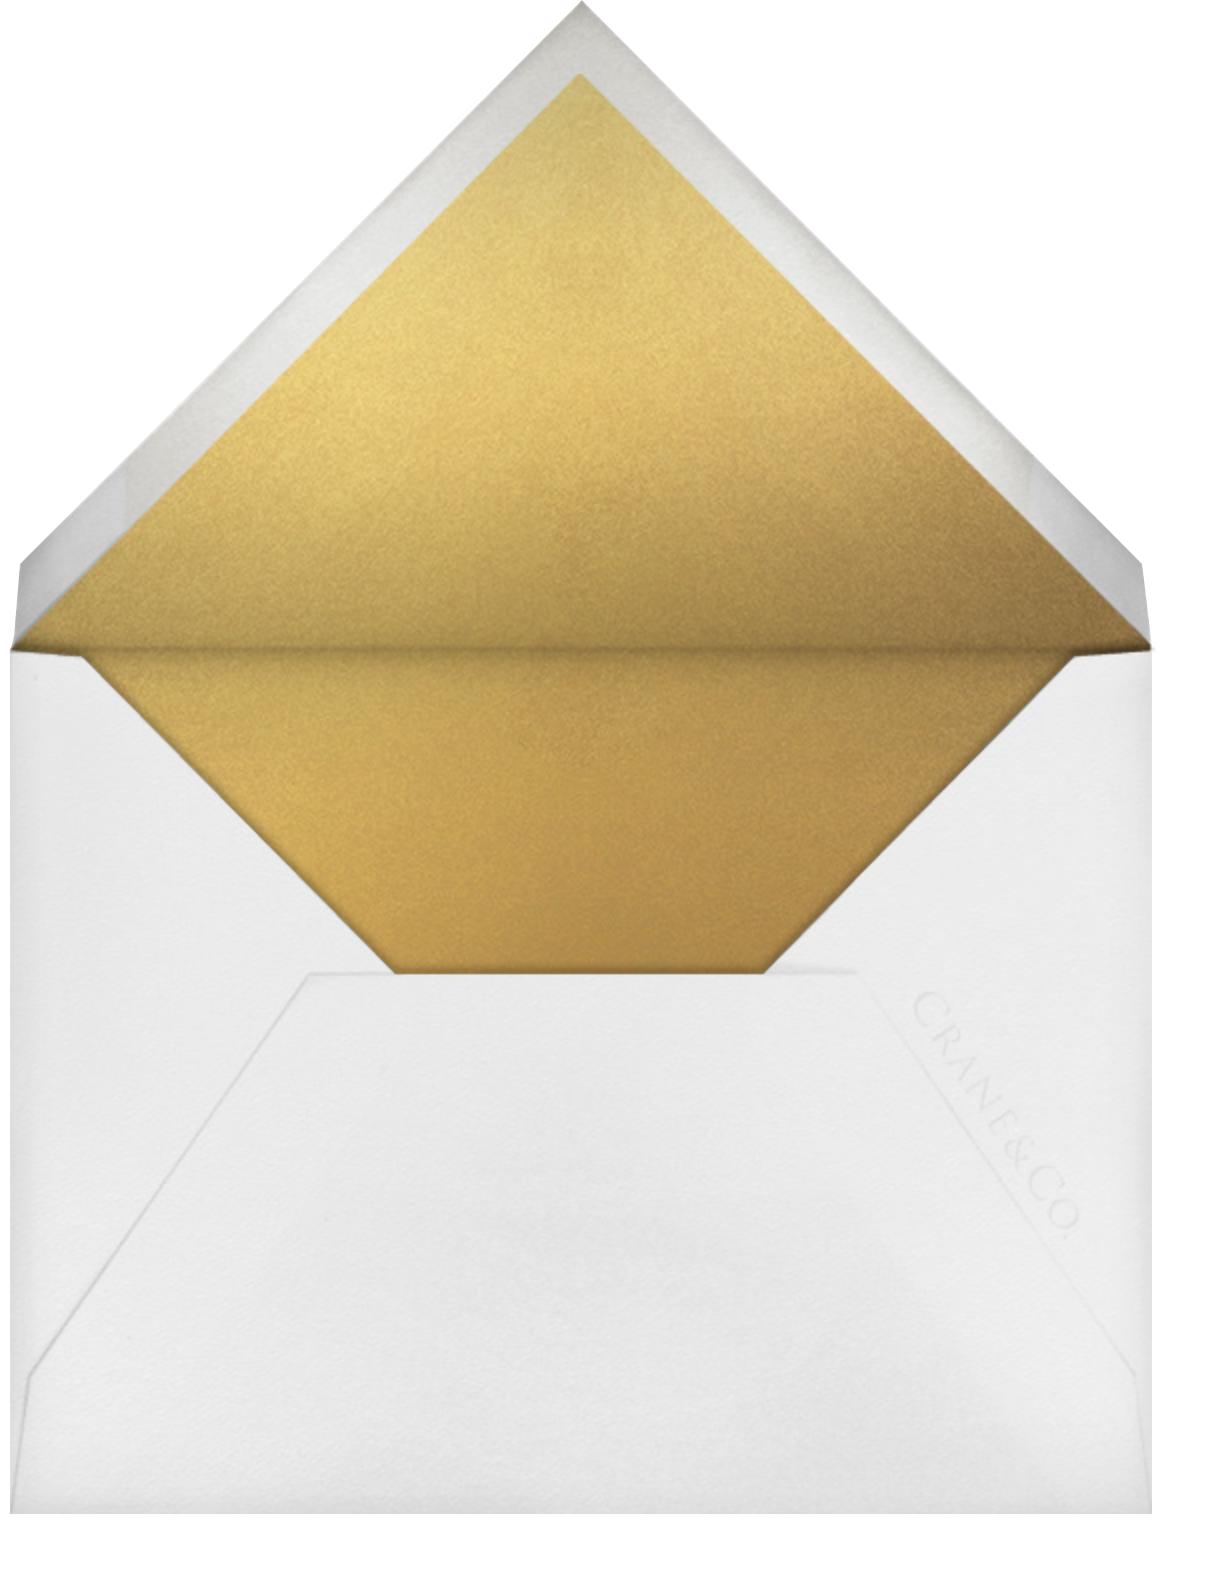 Ledger - Gold - Vera Wang - Anniversary party - envelope back